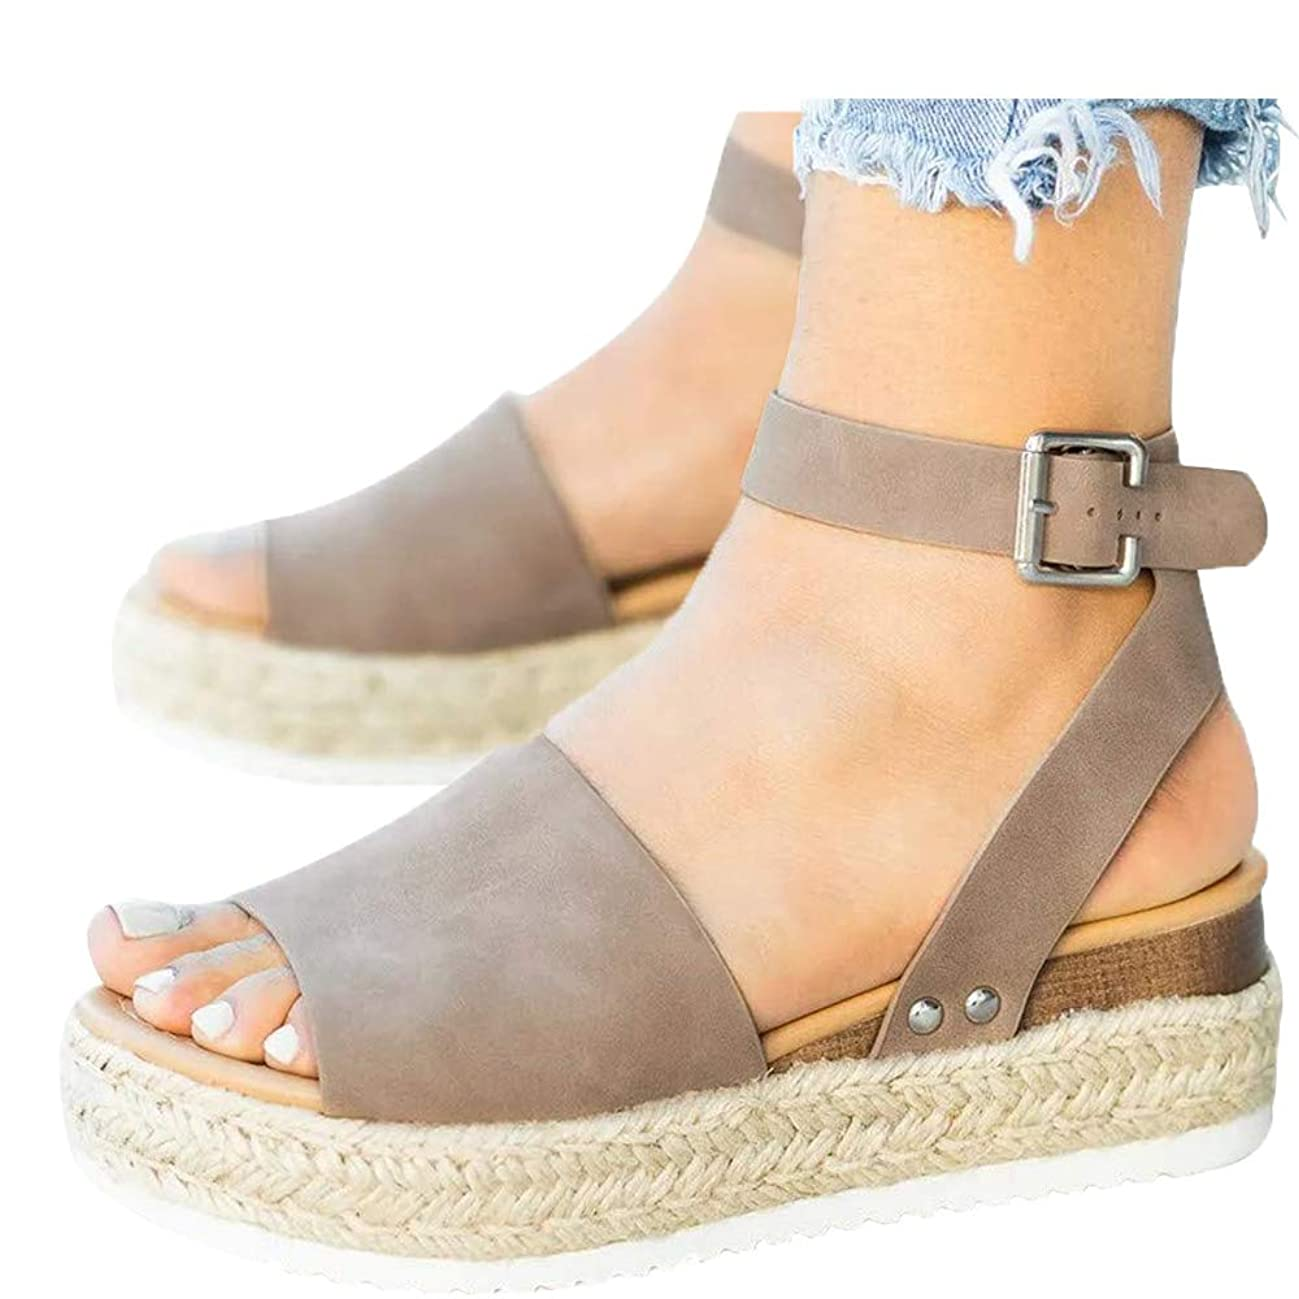 Athlefit Women's Platform Sandals Espadrille Wedge Ankle Strap Studded Open Toe Sandals